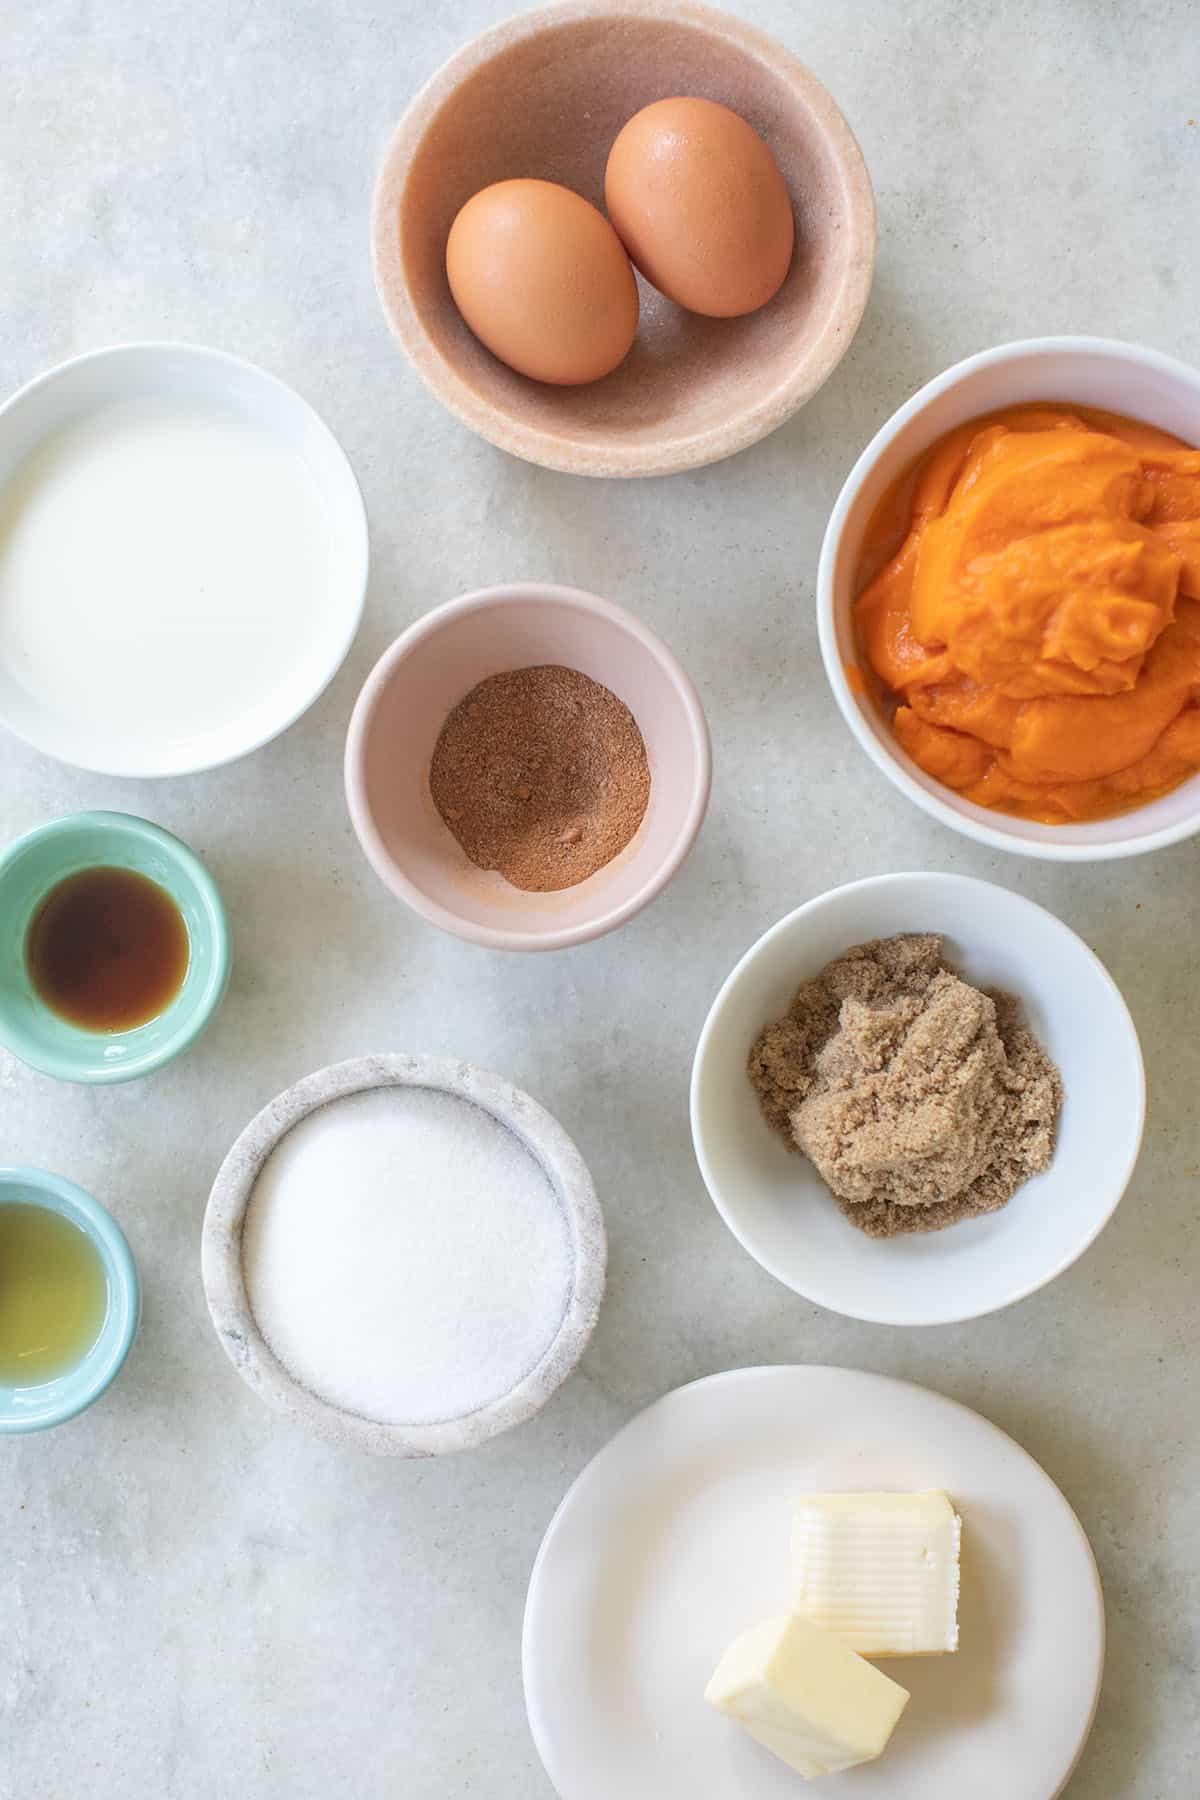 ingredients to make sweet potato pie